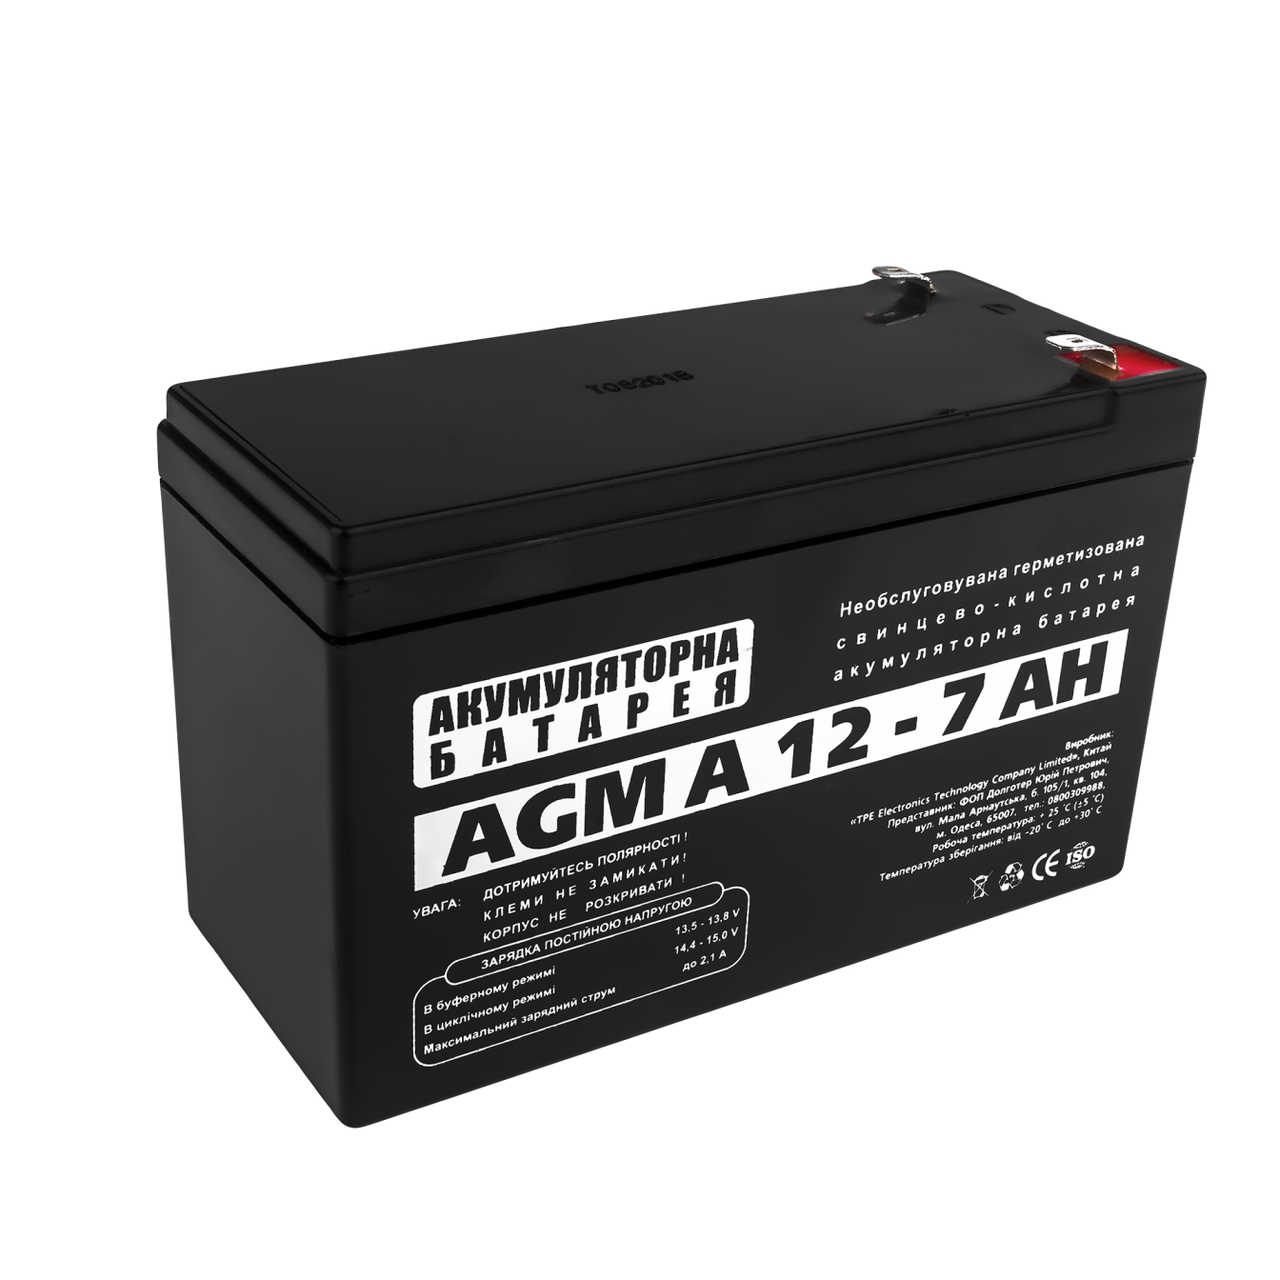 AGM Аккумулятор LogicPower A12-7 (12 Вольт, 7 Ач)